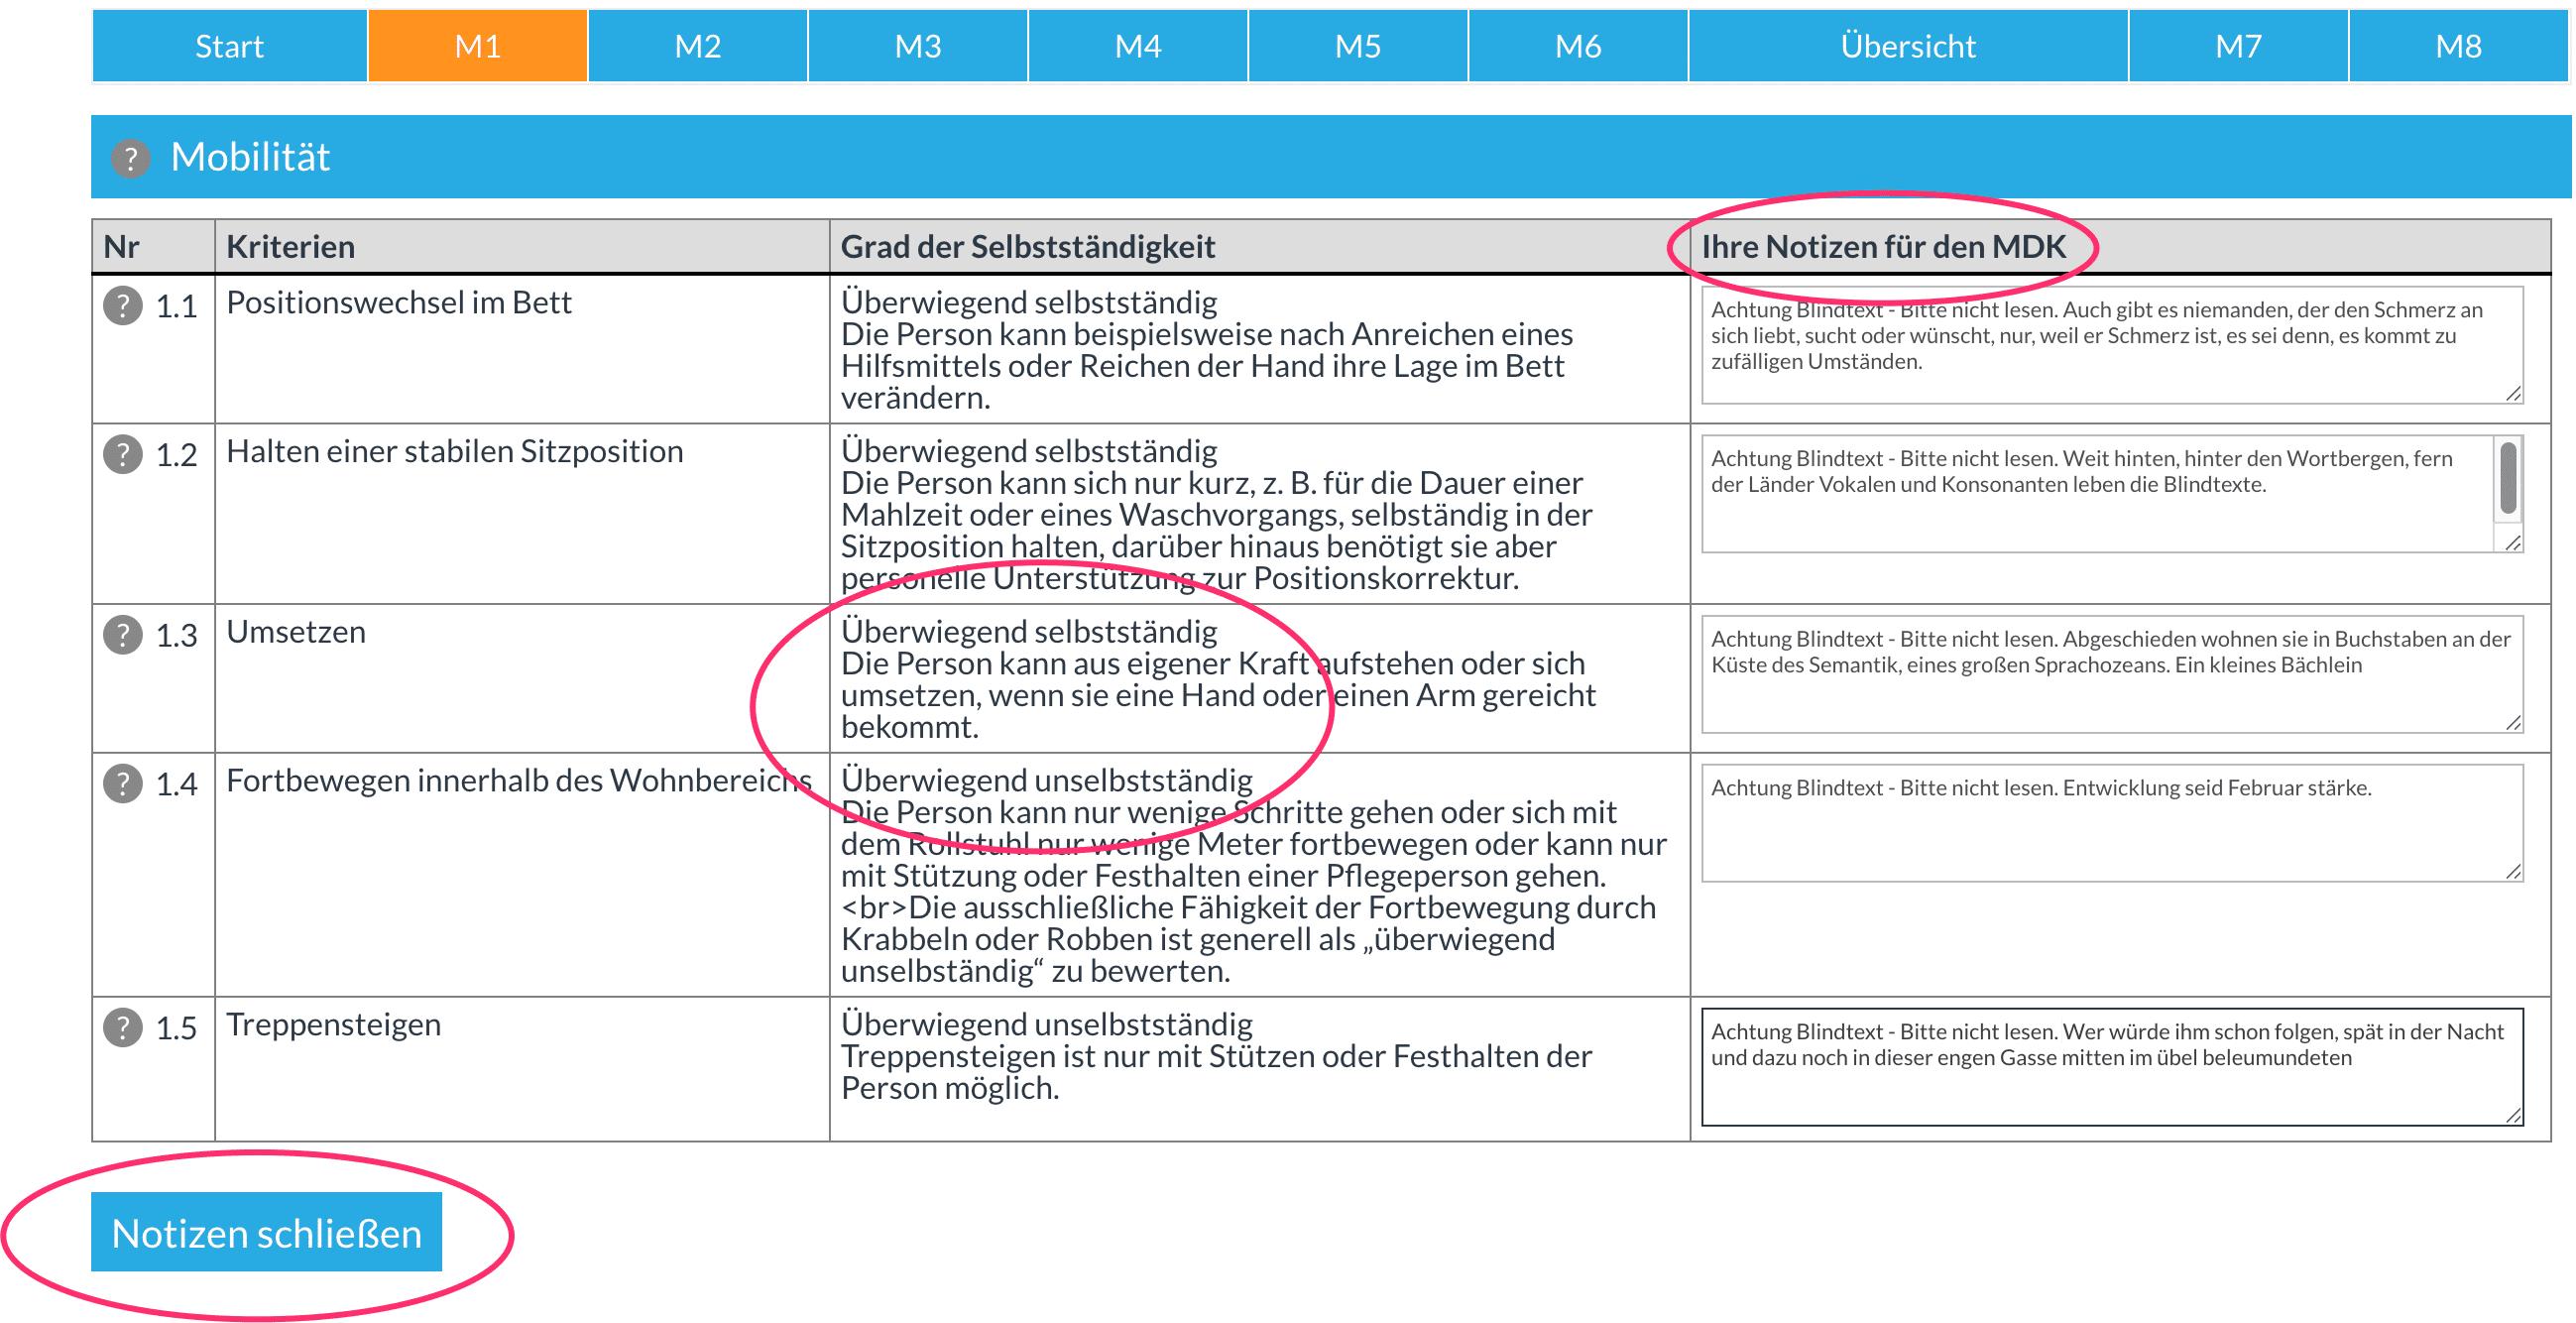 Kriterien-Infos im direkt Notiz-Kontext.